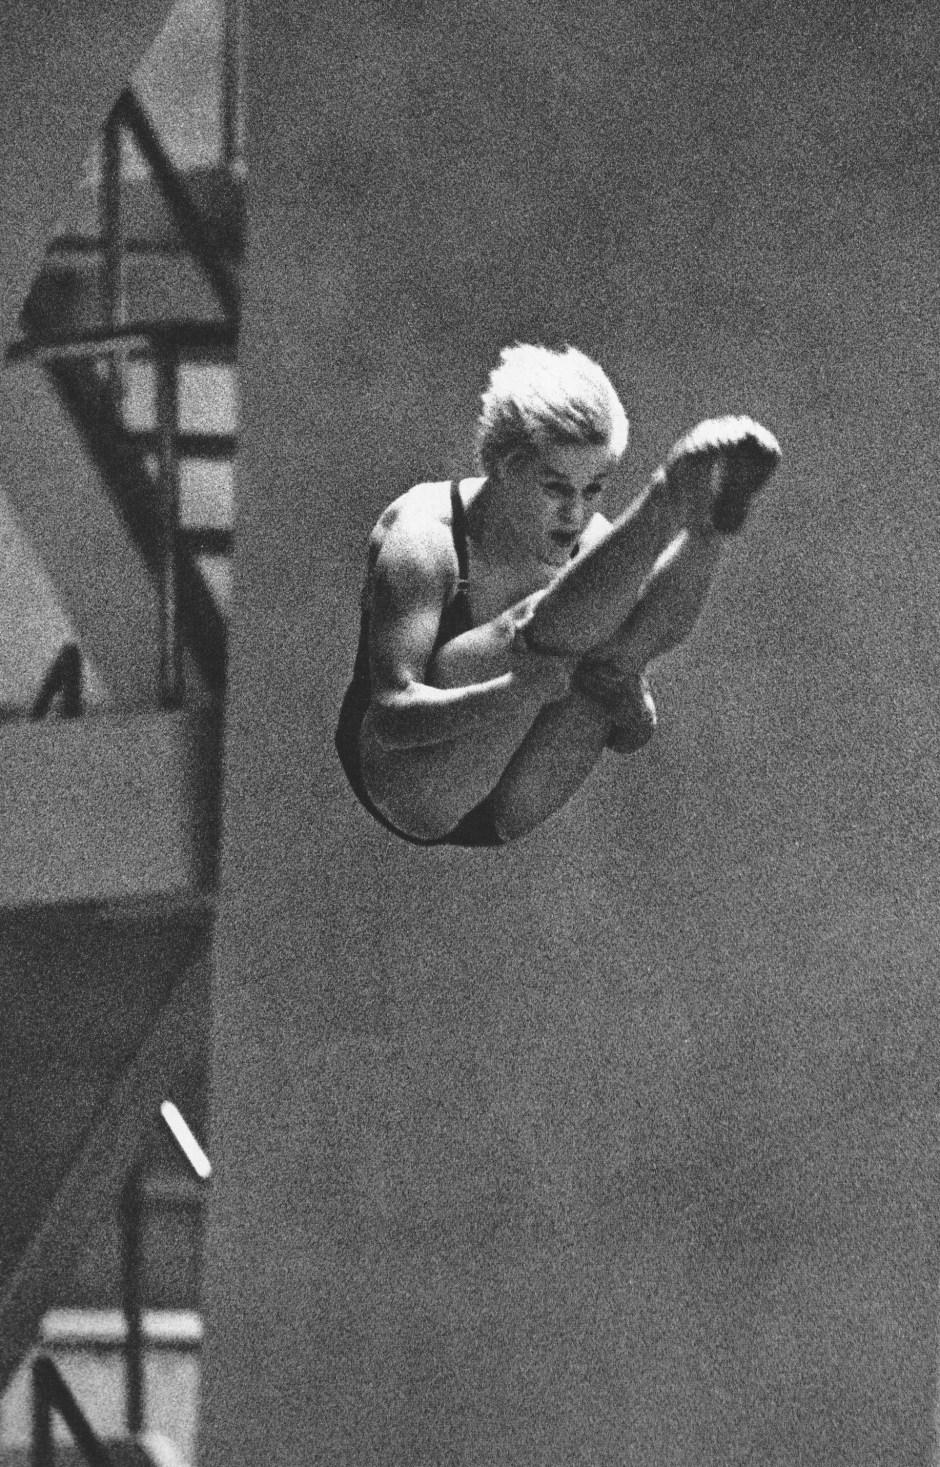 ingrid-engel-kraemer-tokyo1964_xviii-olympiad-tokyo-1964_asahi-shinbun